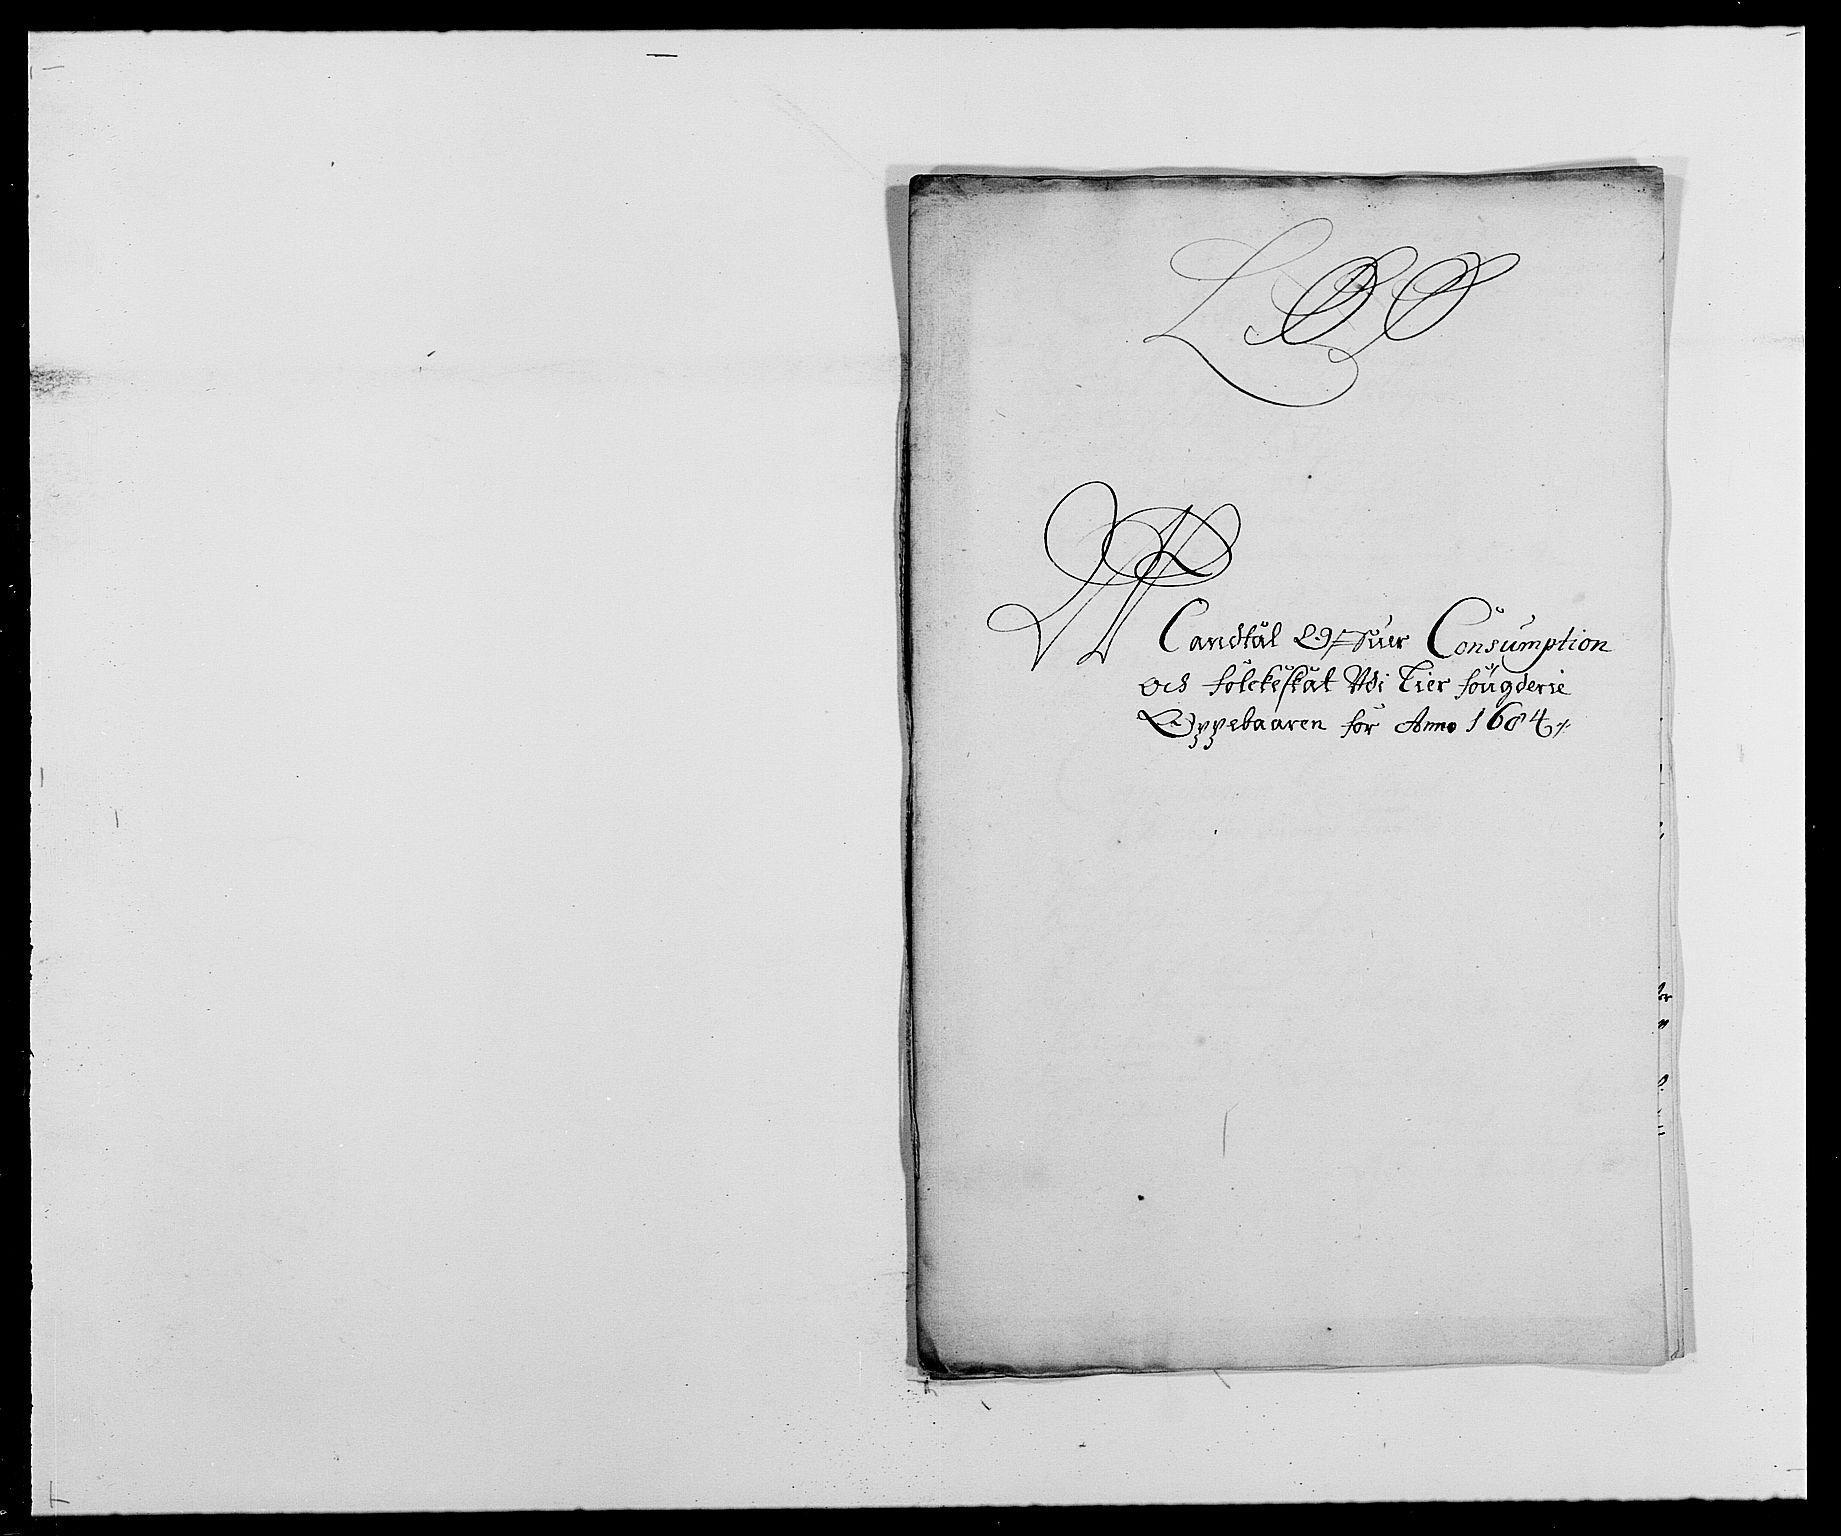 RA, Rentekammeret inntil 1814, Reviderte regnskaper, Fogderegnskap, R27/L1687: Fogderegnskap Lier, 1678-1686, s. 131